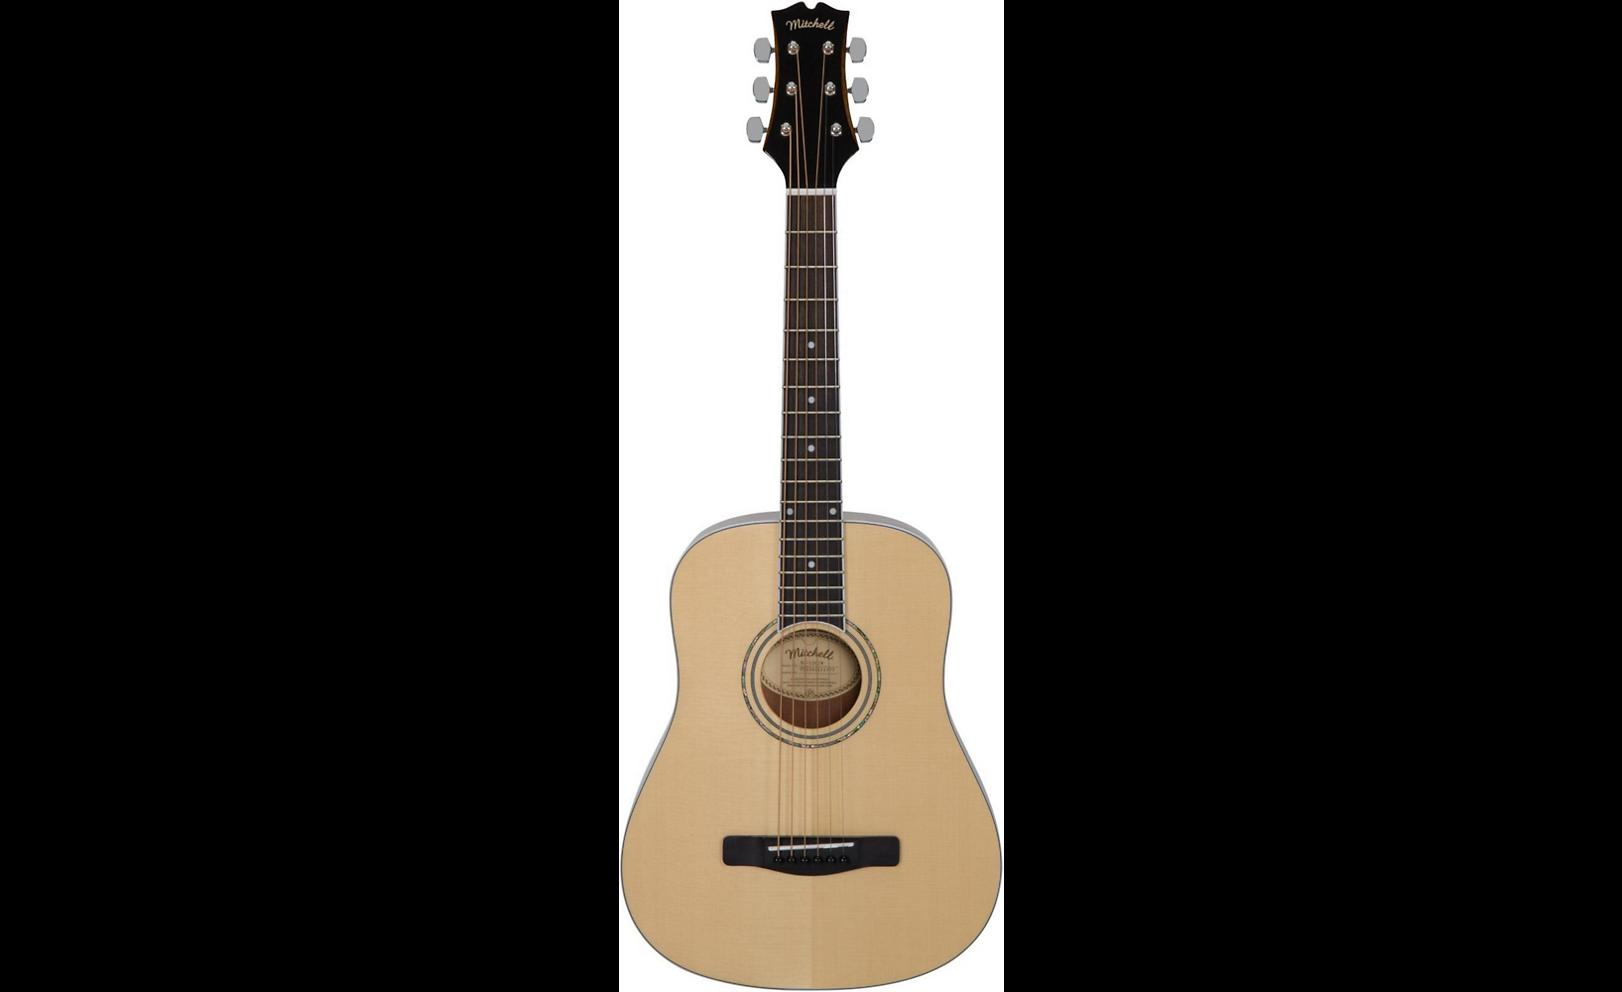 Mini Acoustic Guitars: Mitchell DJ120 Jr Dreadnought $100 + 16% Rewards, Luna Safari Muse Spruce Bundle $130, D'Angelico Premier from $180, Bristol BF-15 Folk $200 + Free S/H